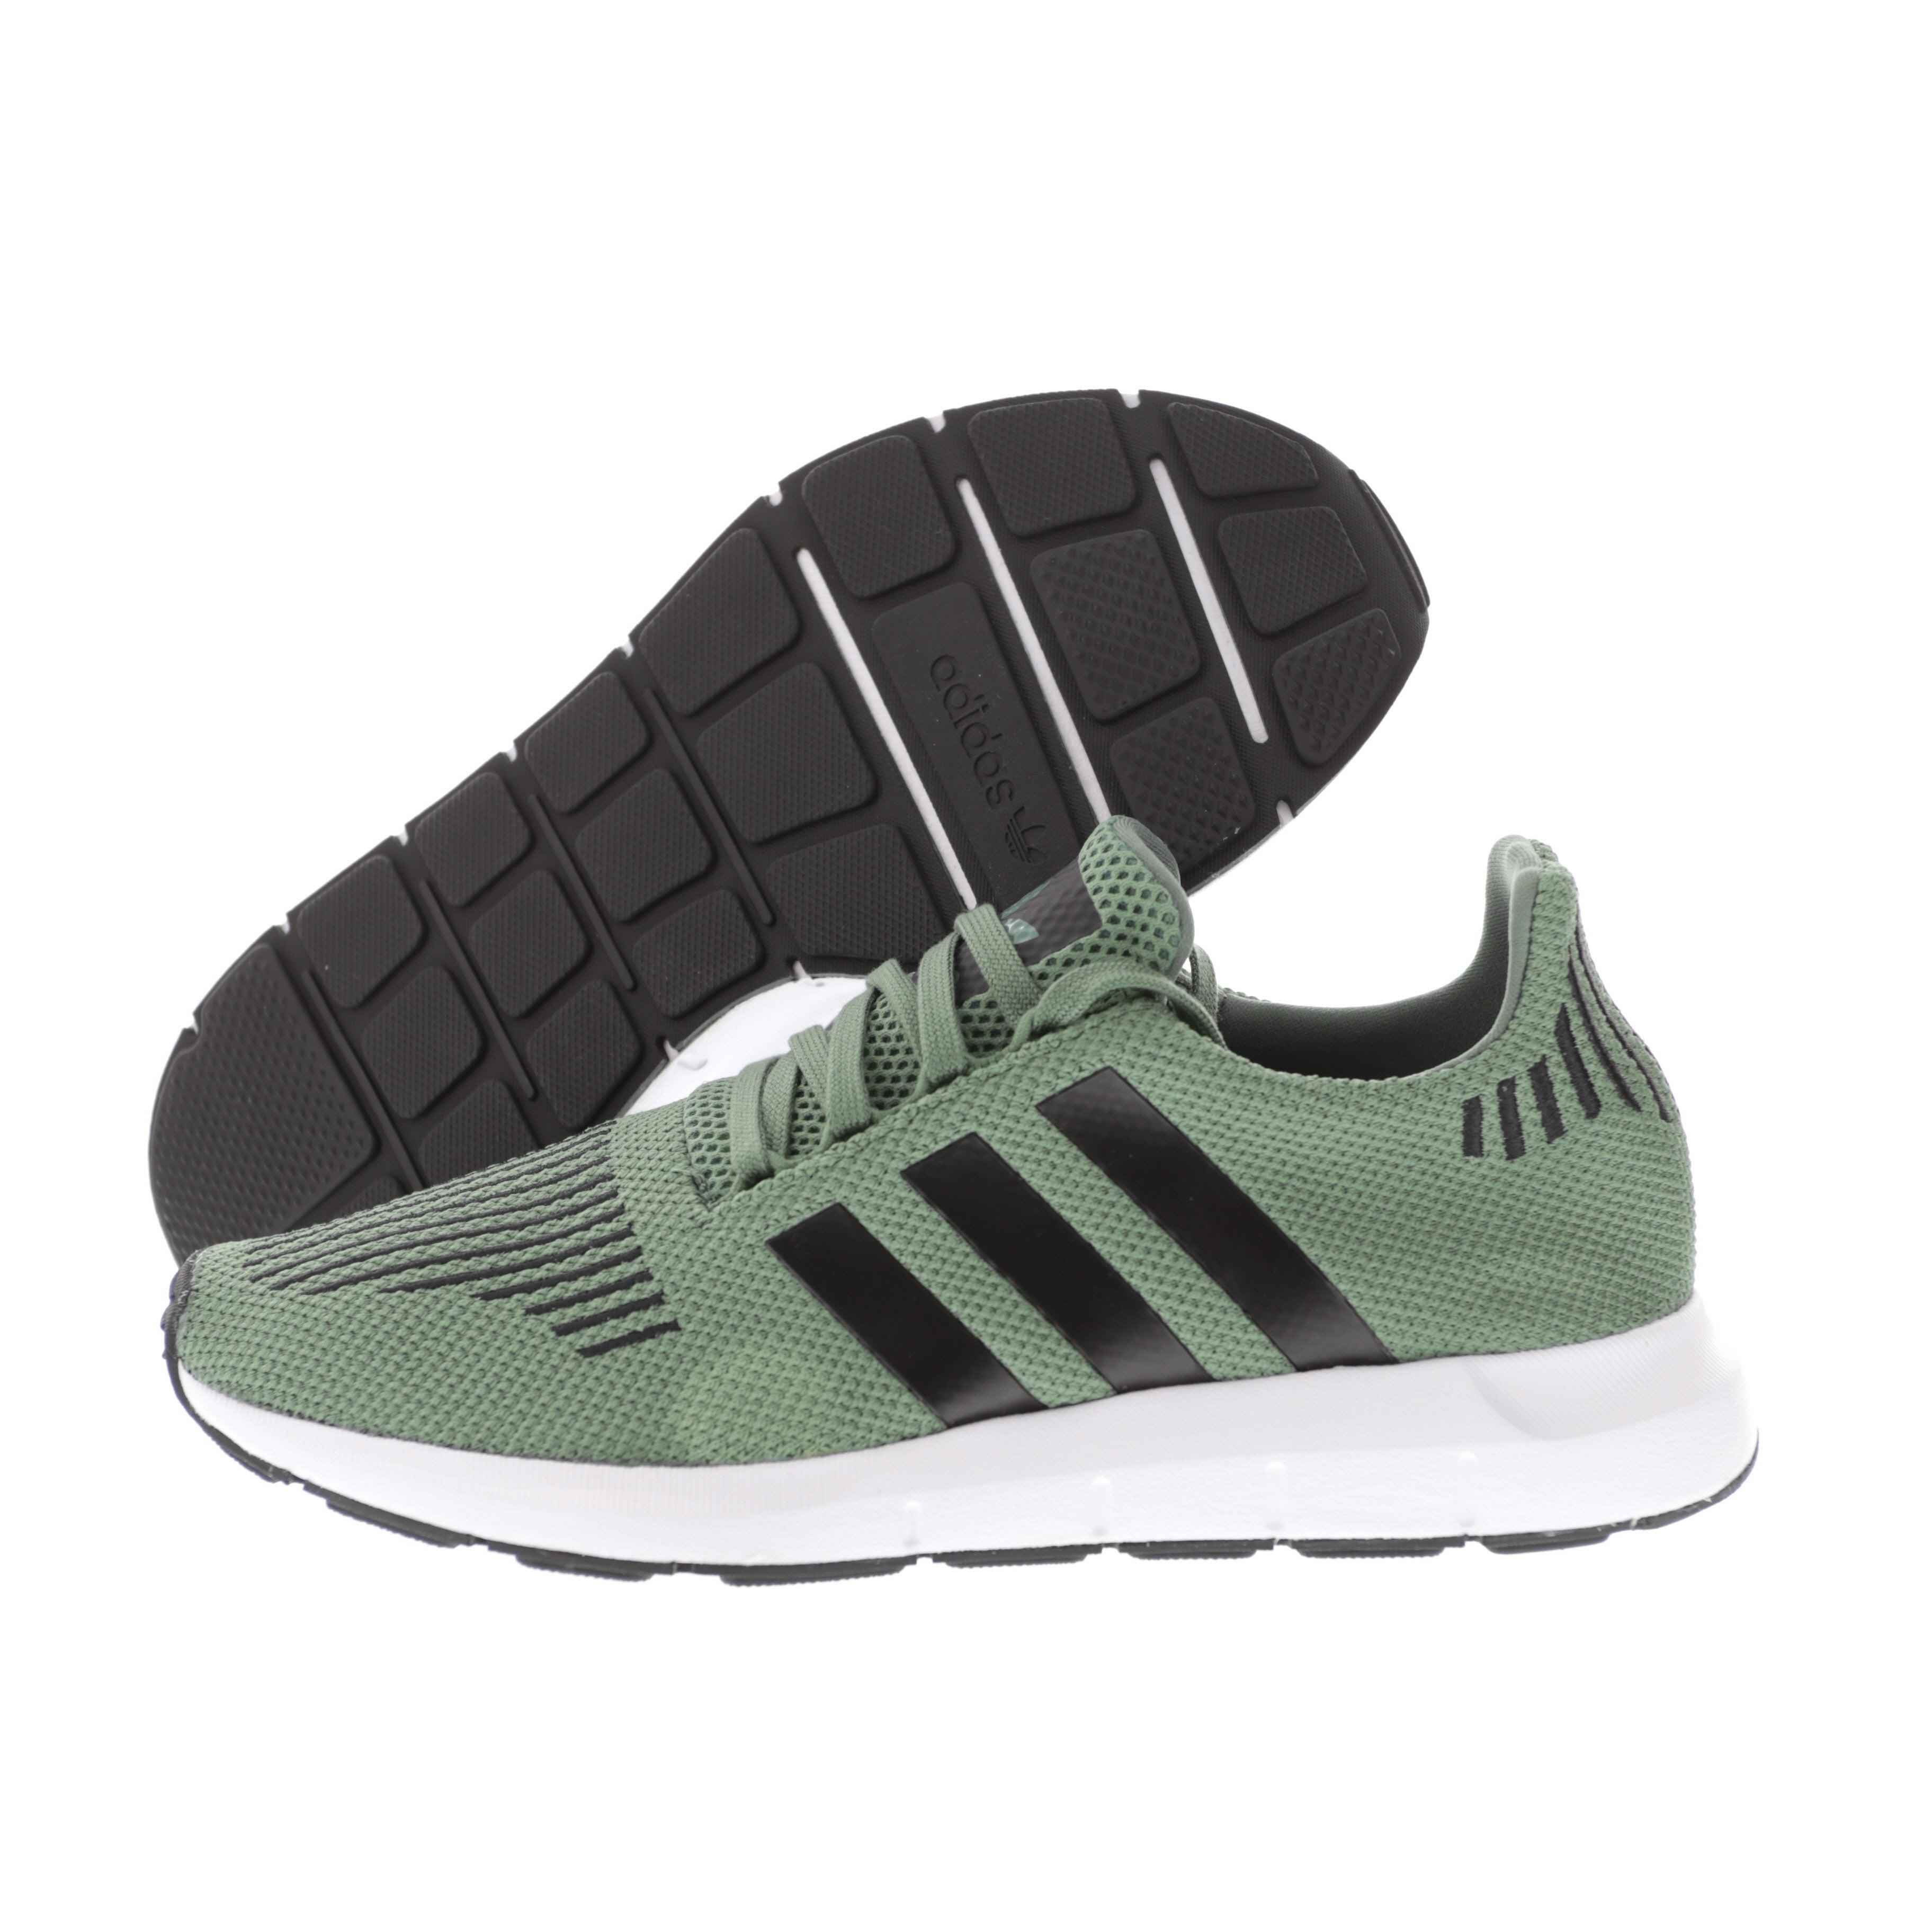 Adidas Originals Swift Run Green/Black